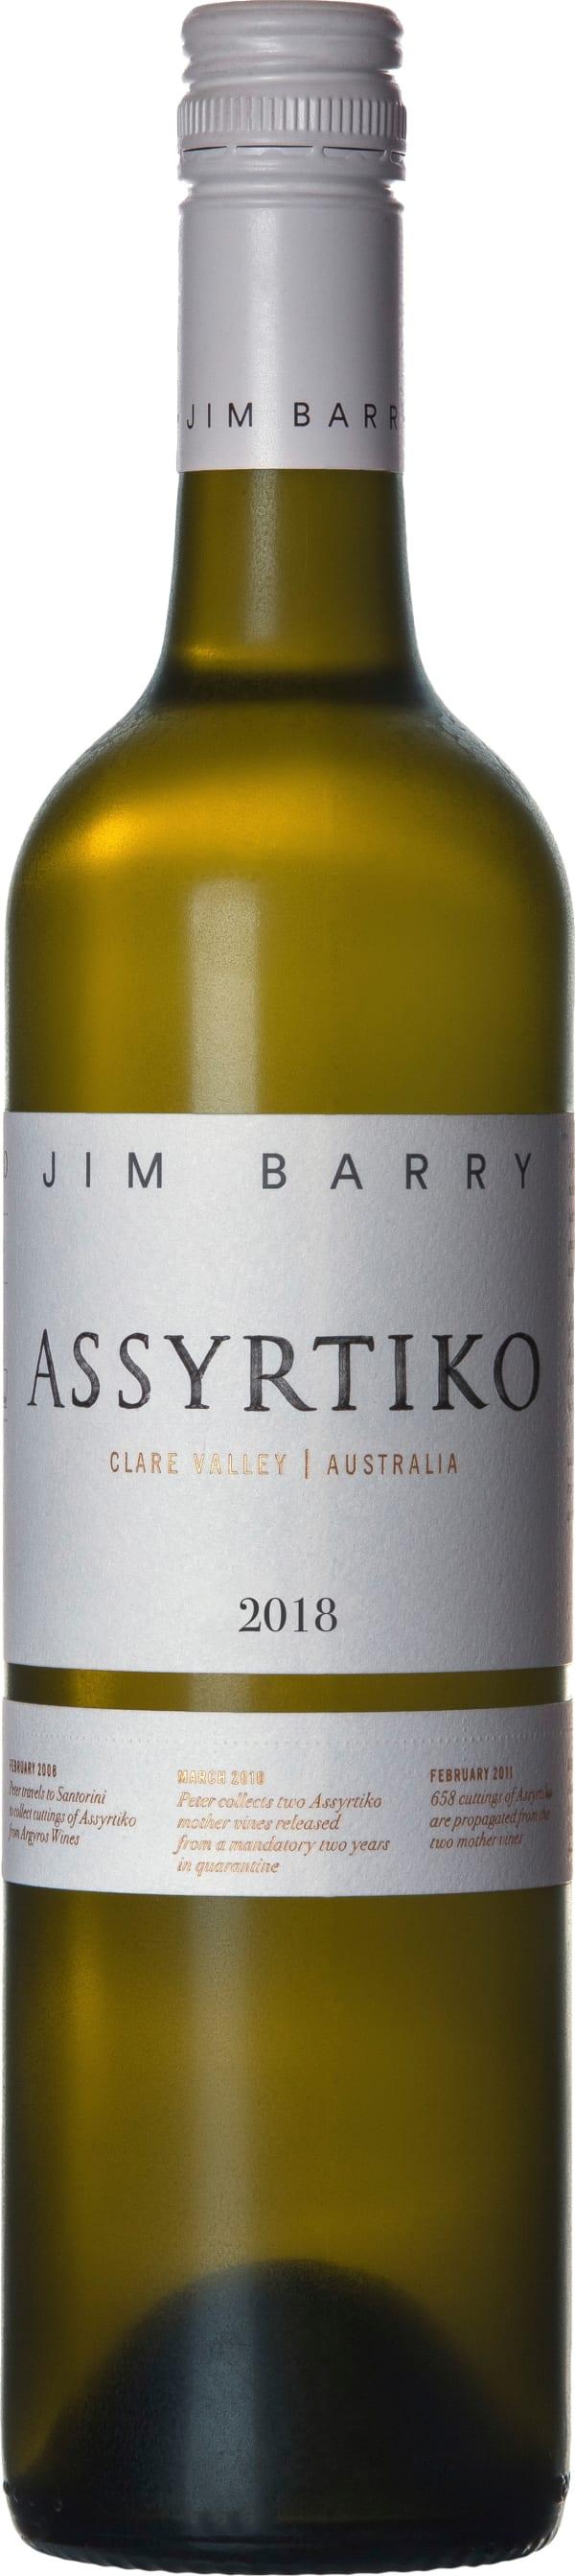 Jim Barry Assyrtiko 2018